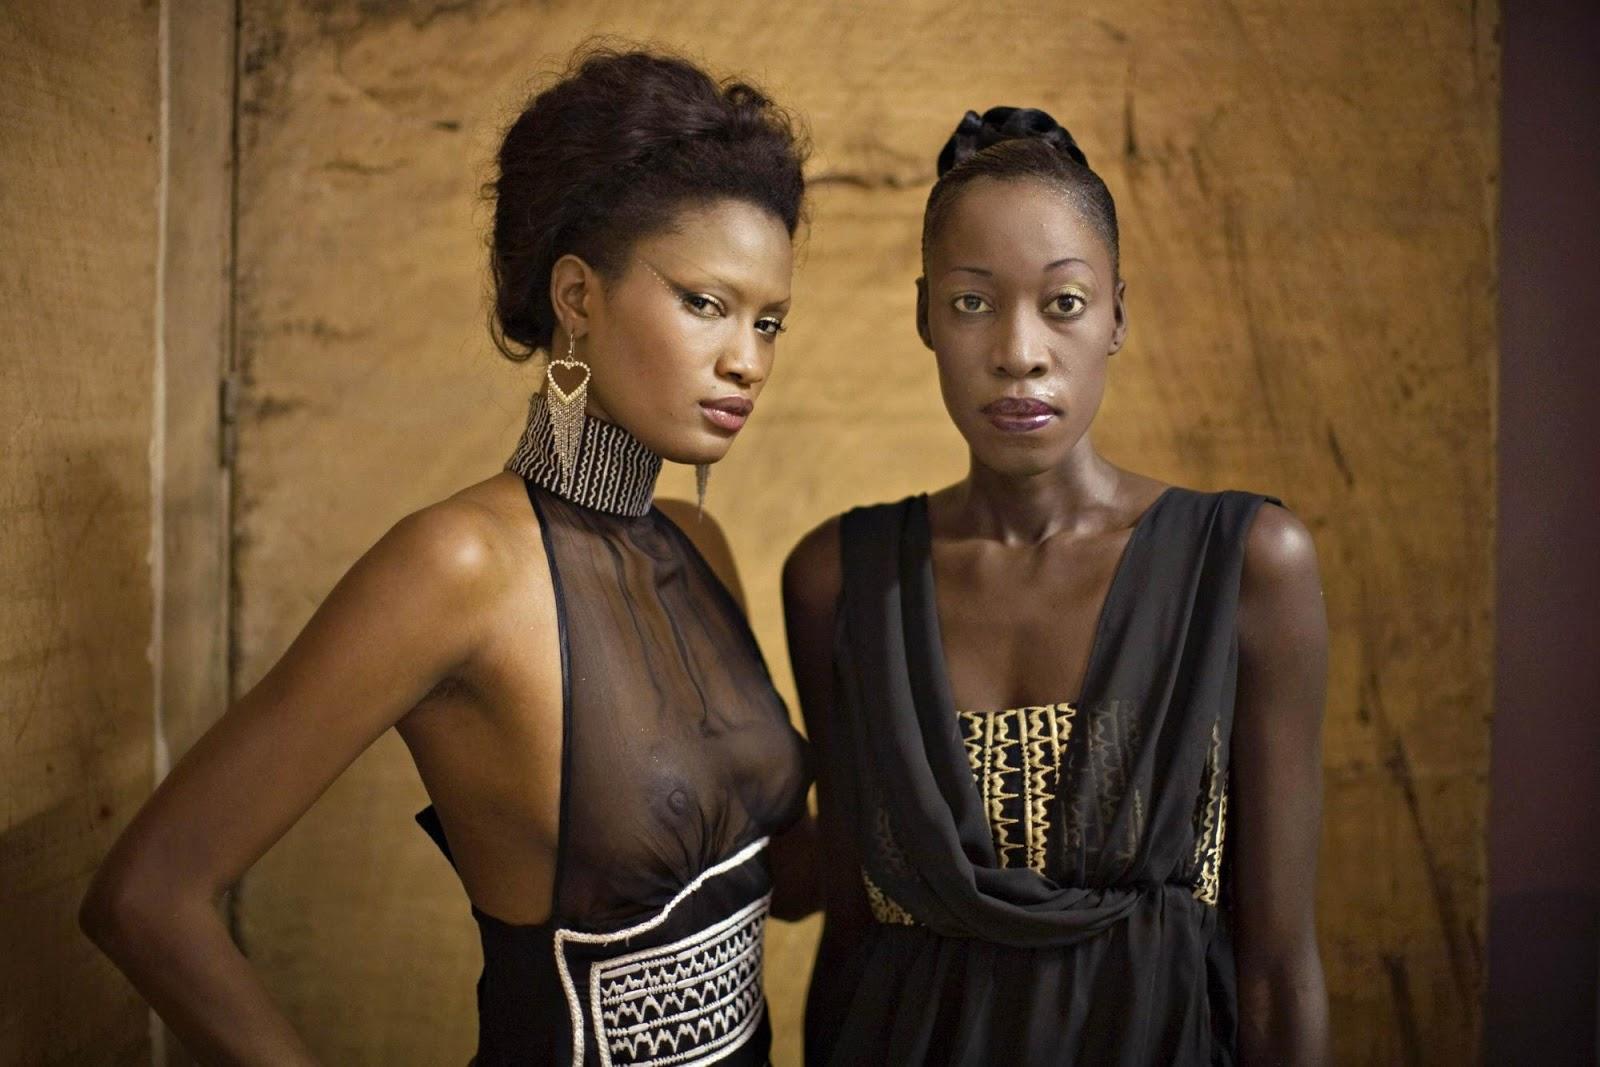 News Senegal Models Who Bleach Their Skin Banned At Dakar Fashion Week Afroziky